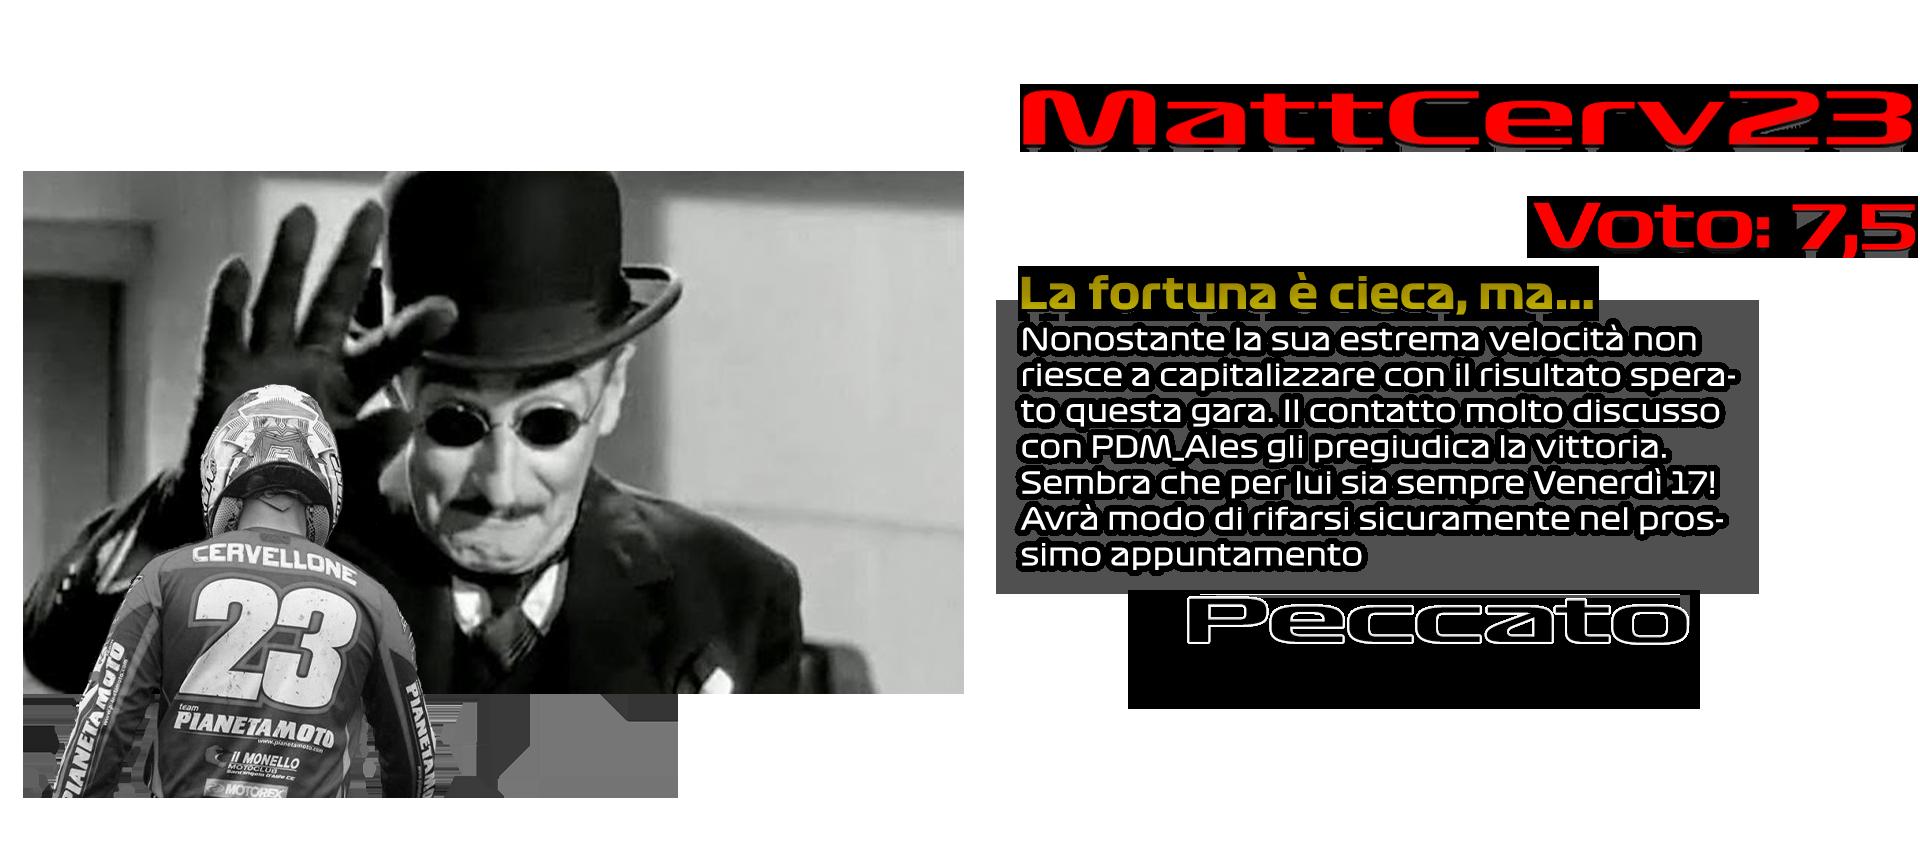 Garetta stasera random GT6-4-mattcerv-png